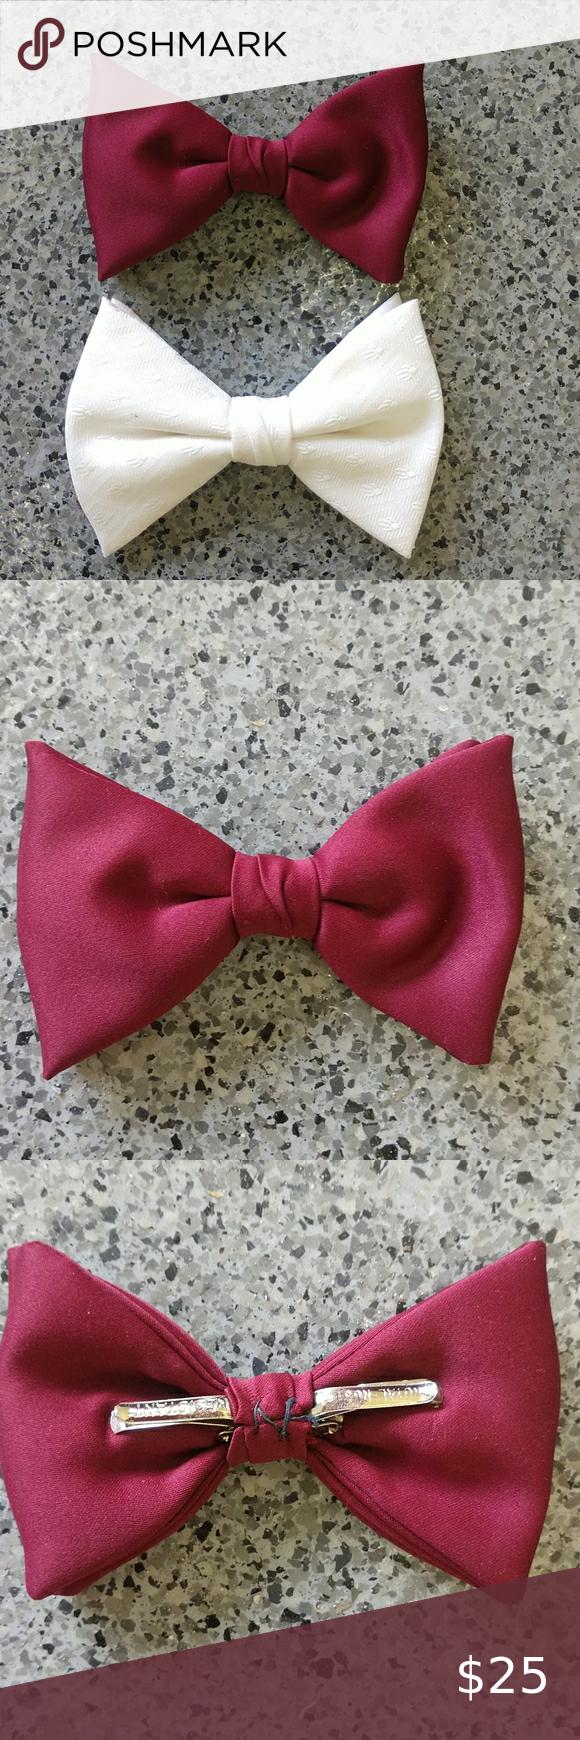 Vintage Bow Ties In 2020 Vintage Bow Tie Bows Vintage